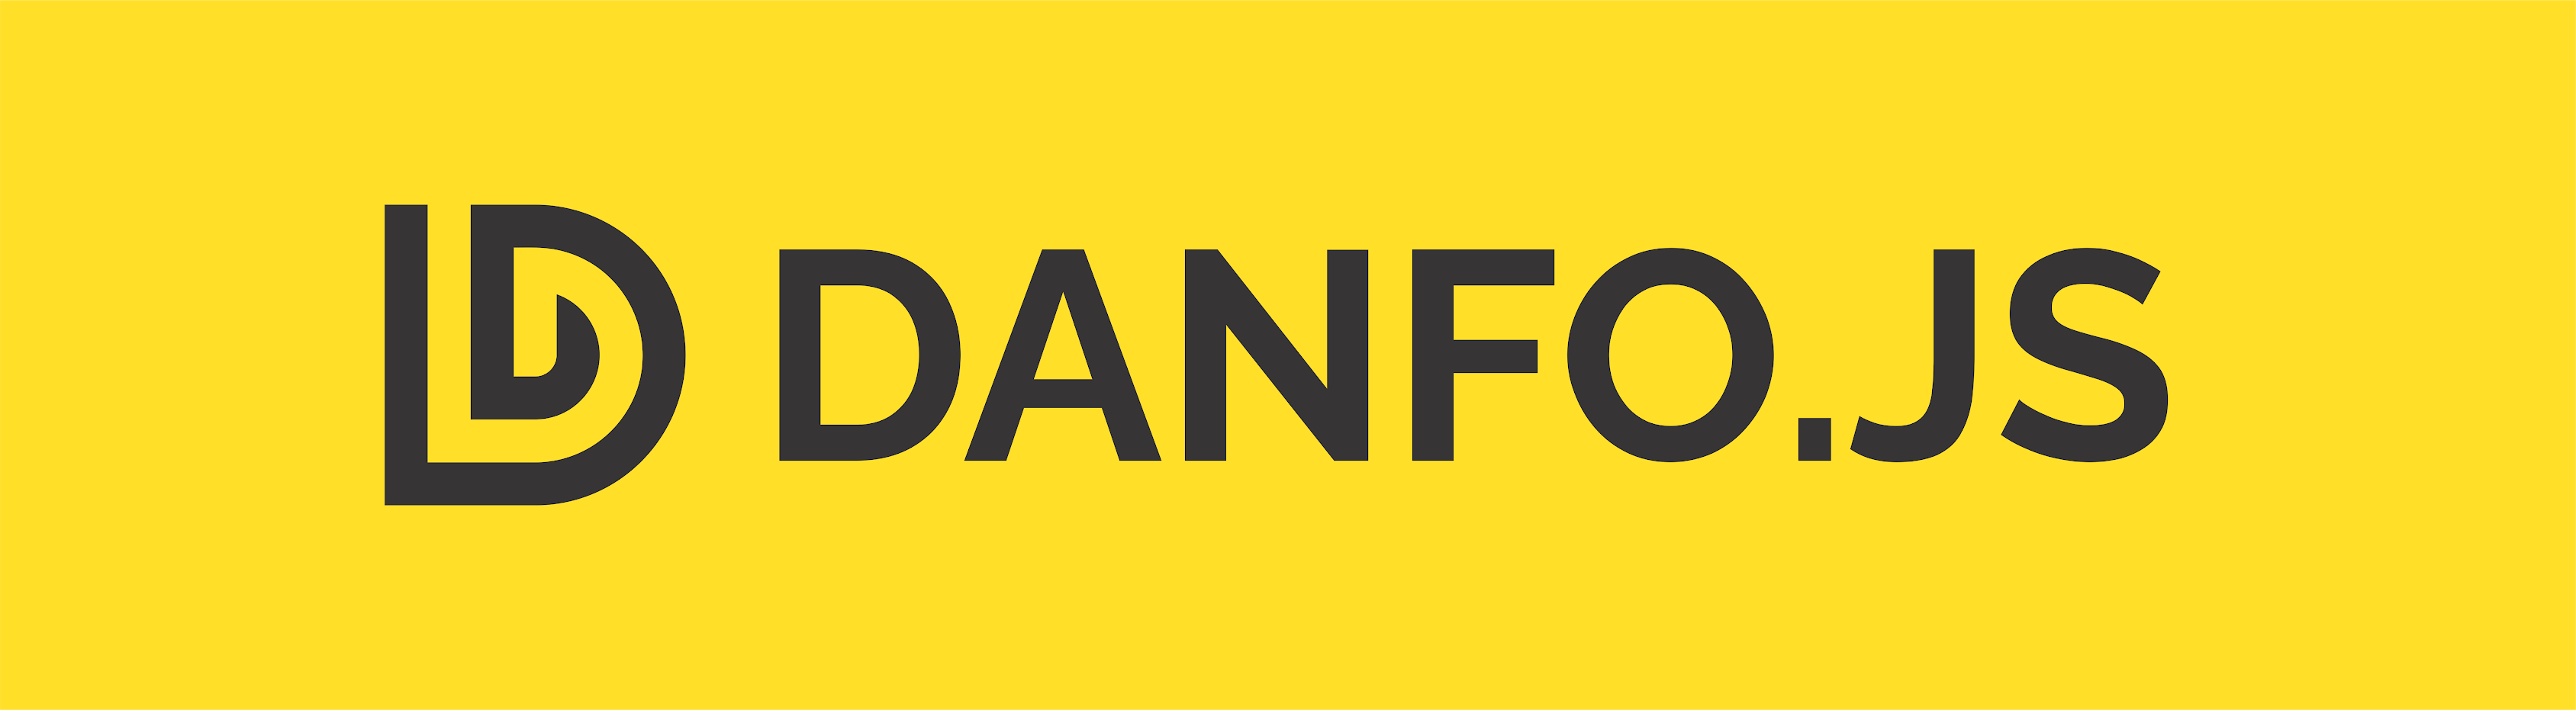 danfo.js analysis framework